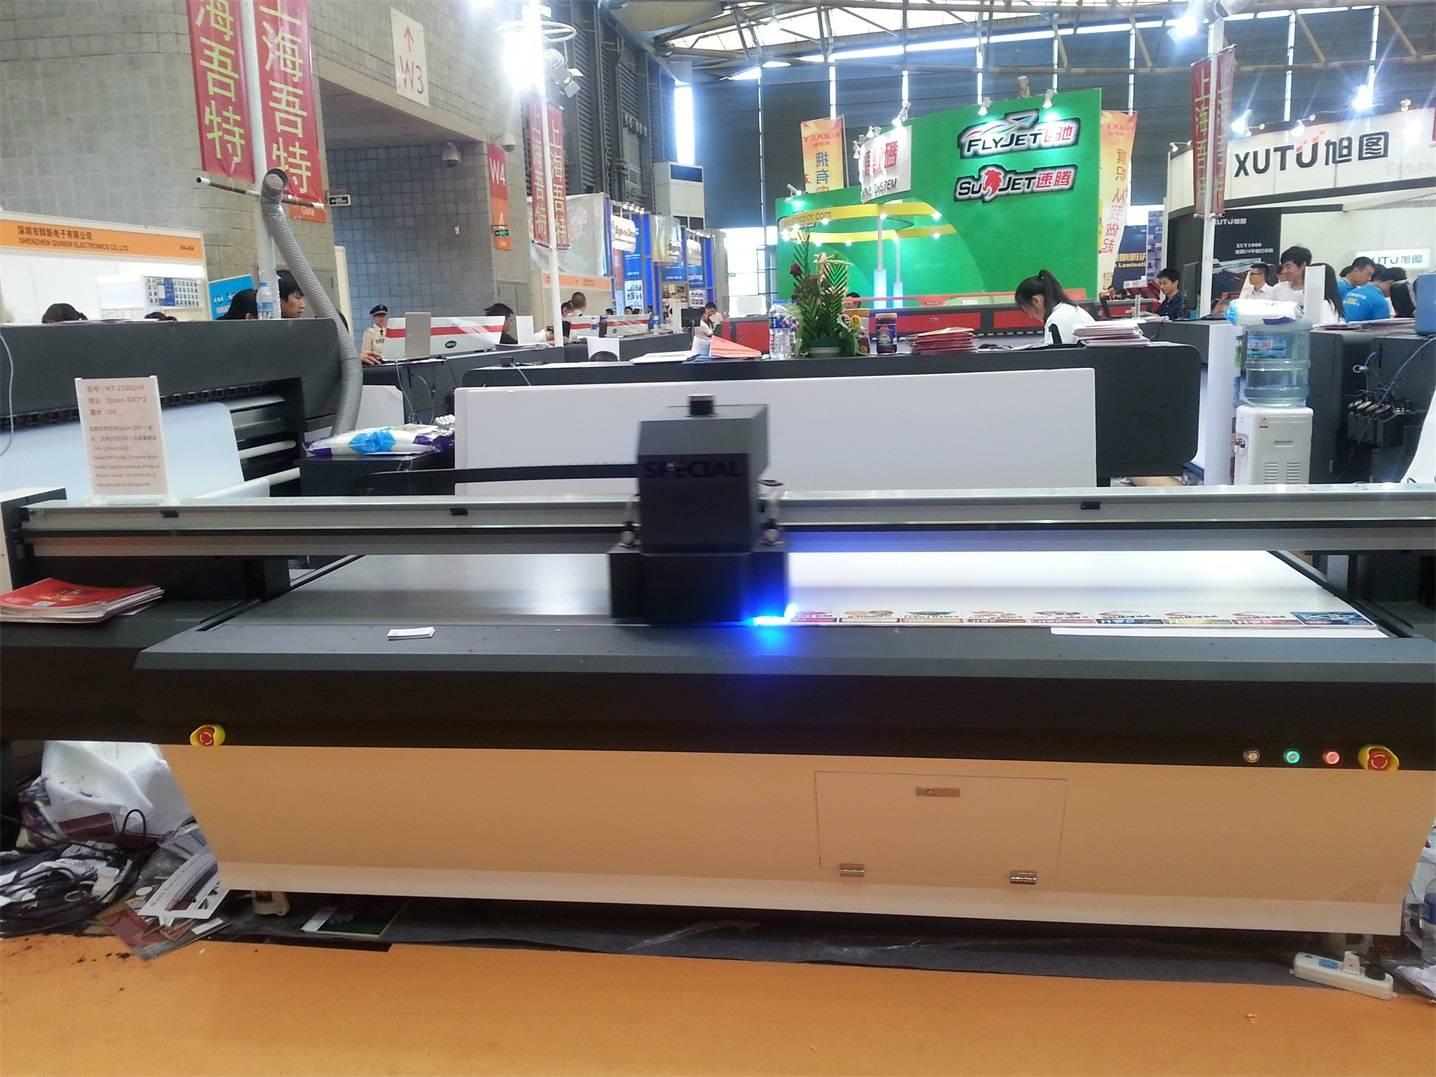 2.5m*1.4m UV Flatbed Printer WT-2500UVF